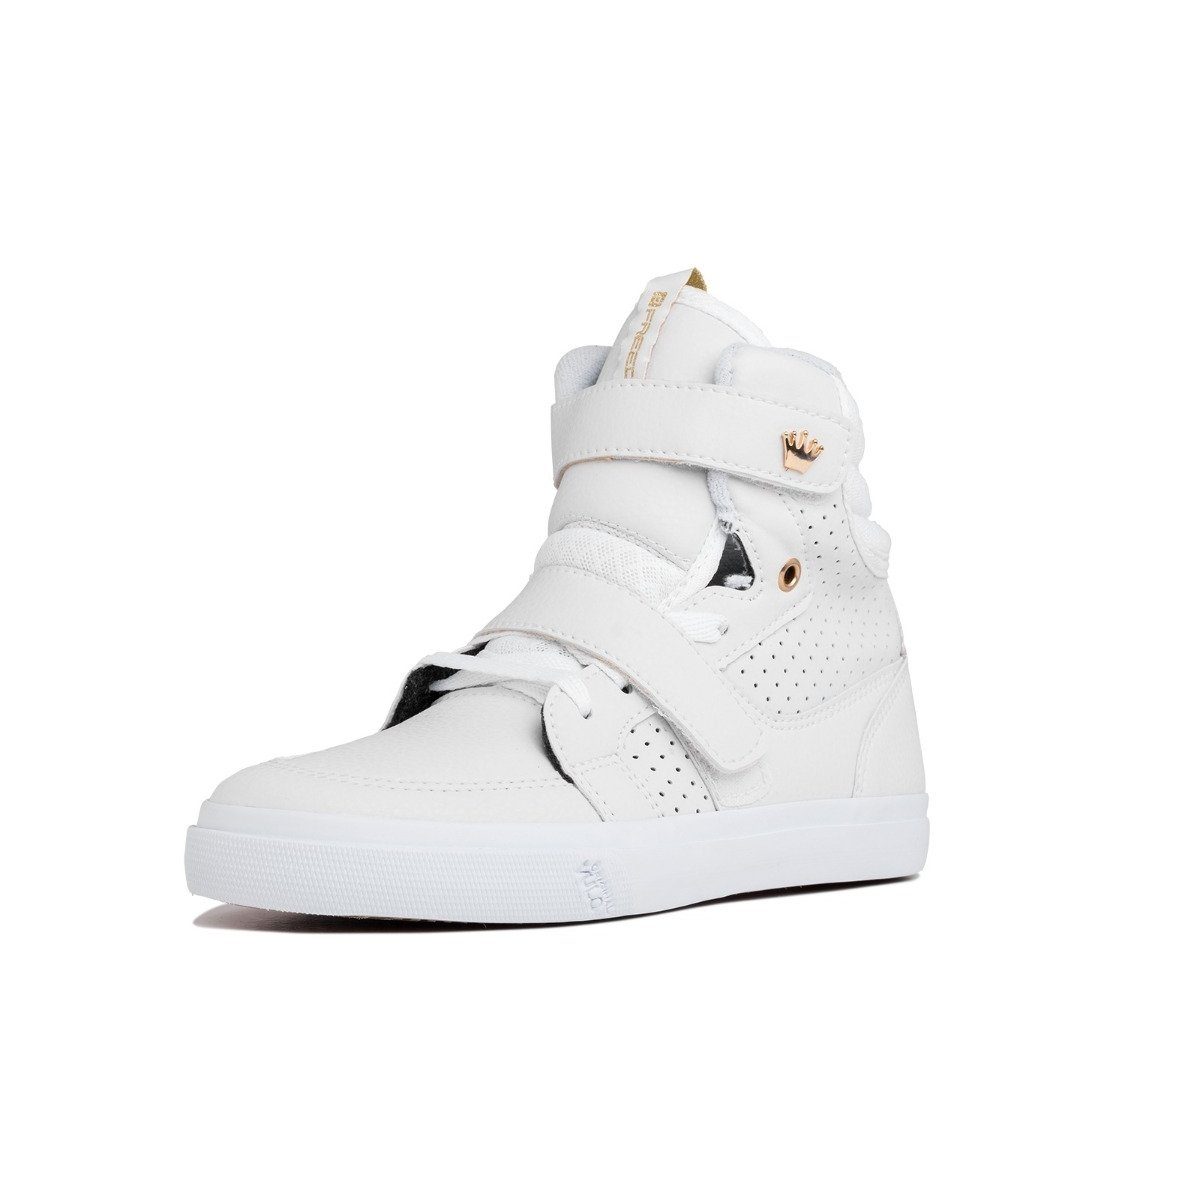 Tênis Skate Freeday Street Dance Vulc - Compre Agora  2bac5848f28b3